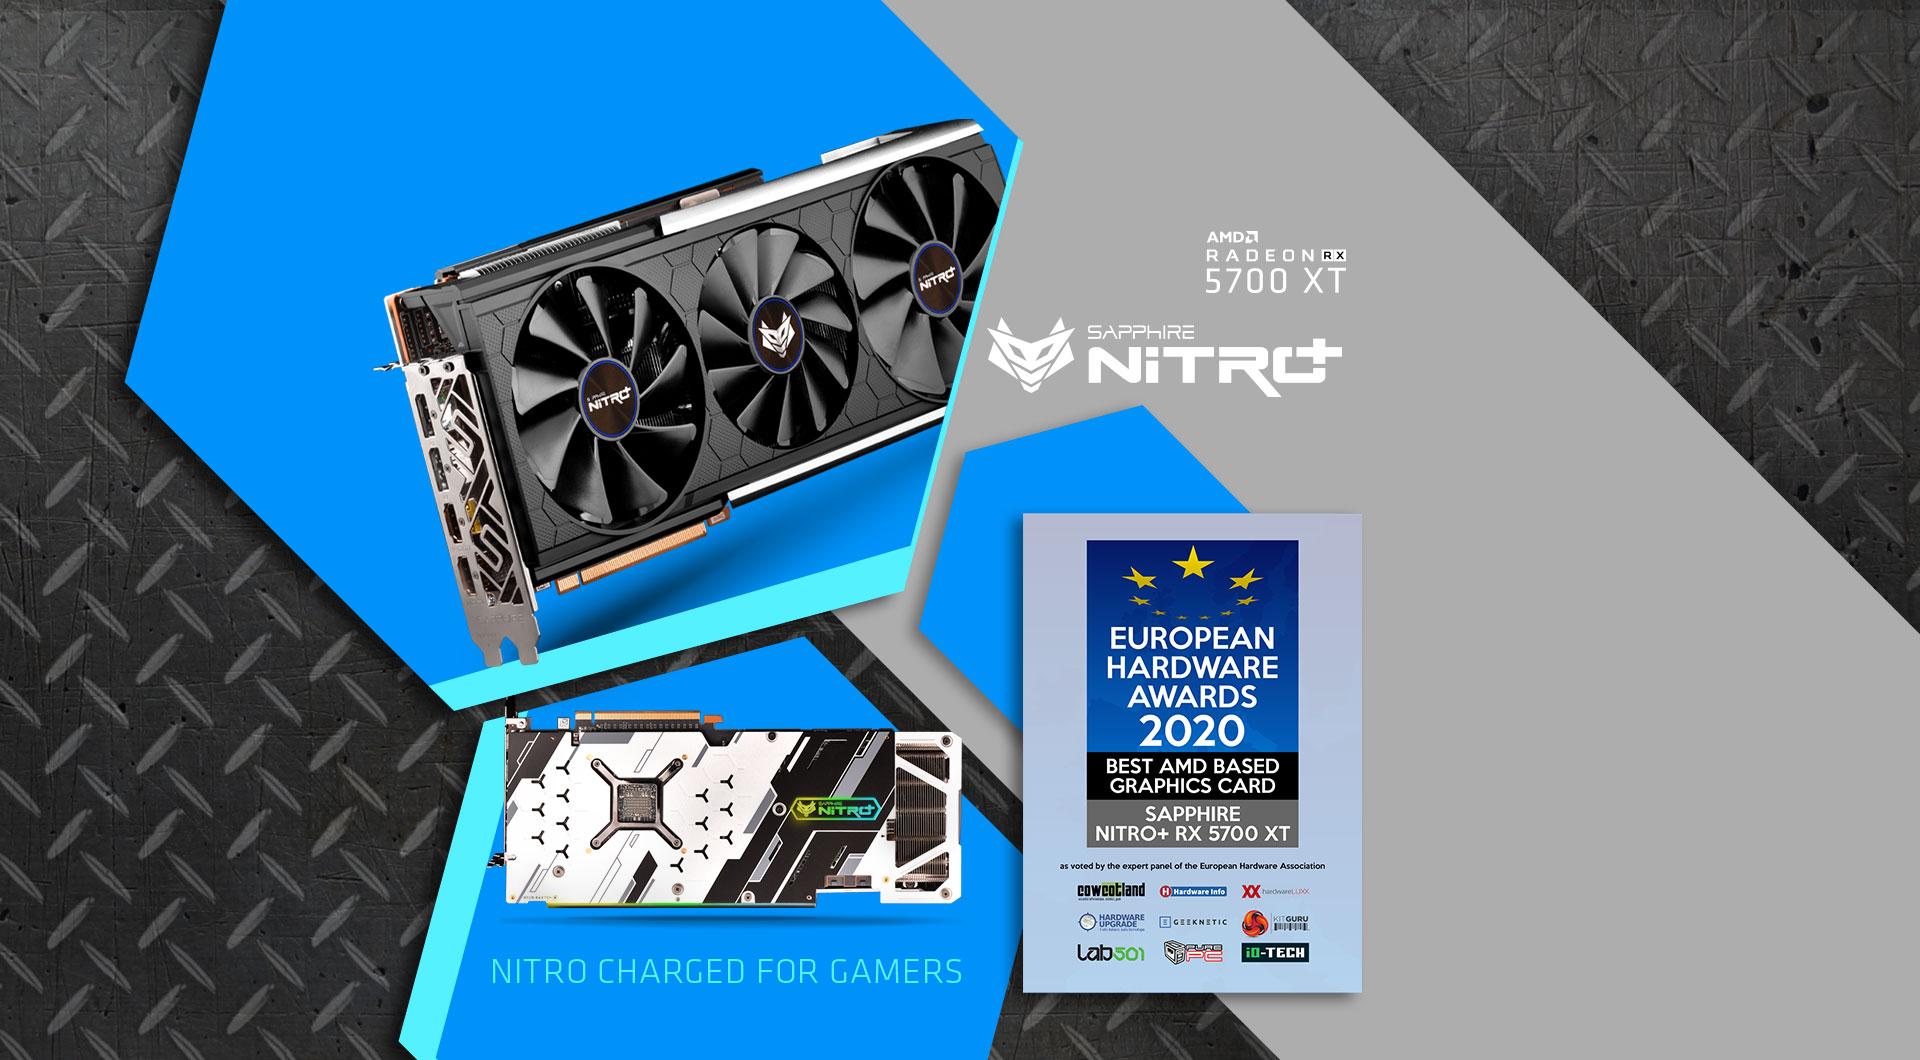 SAPPHIRE NITRO+ RX 5700 XT 8G GDDR6